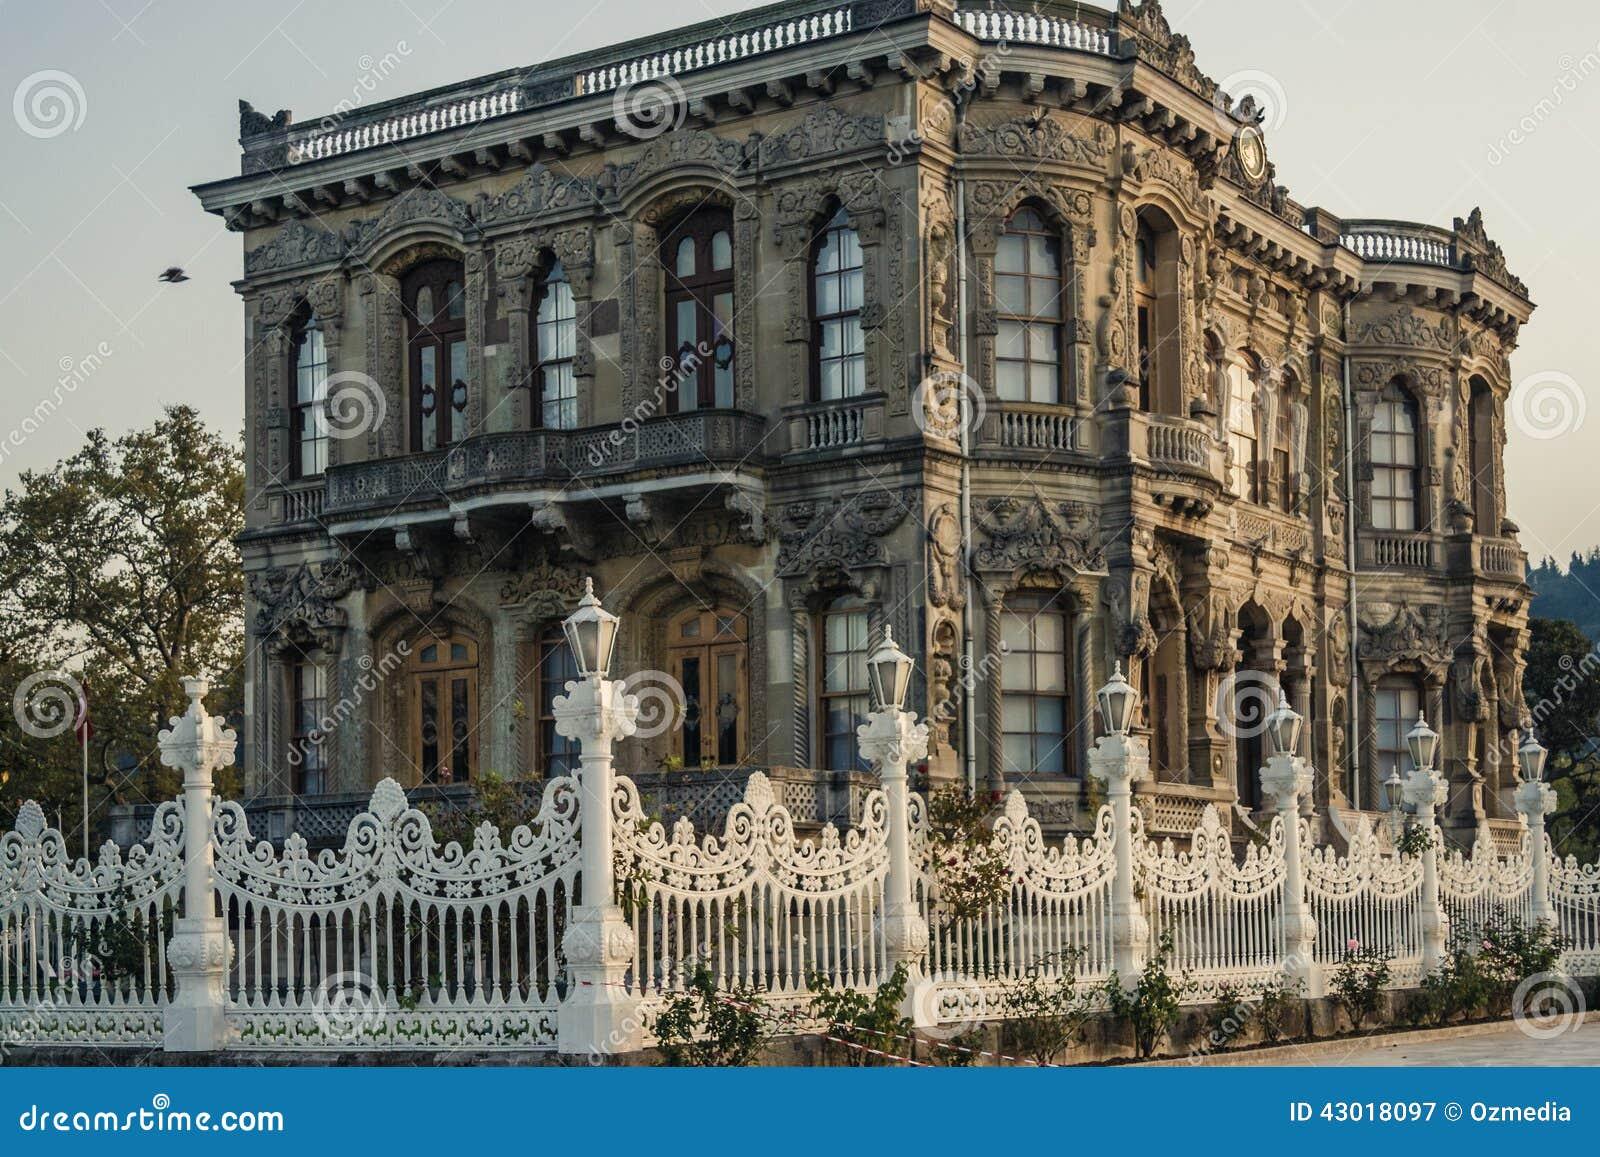 Kucuksu Pavilion In Bosporus, Istanbul Stock Photo - Image ...